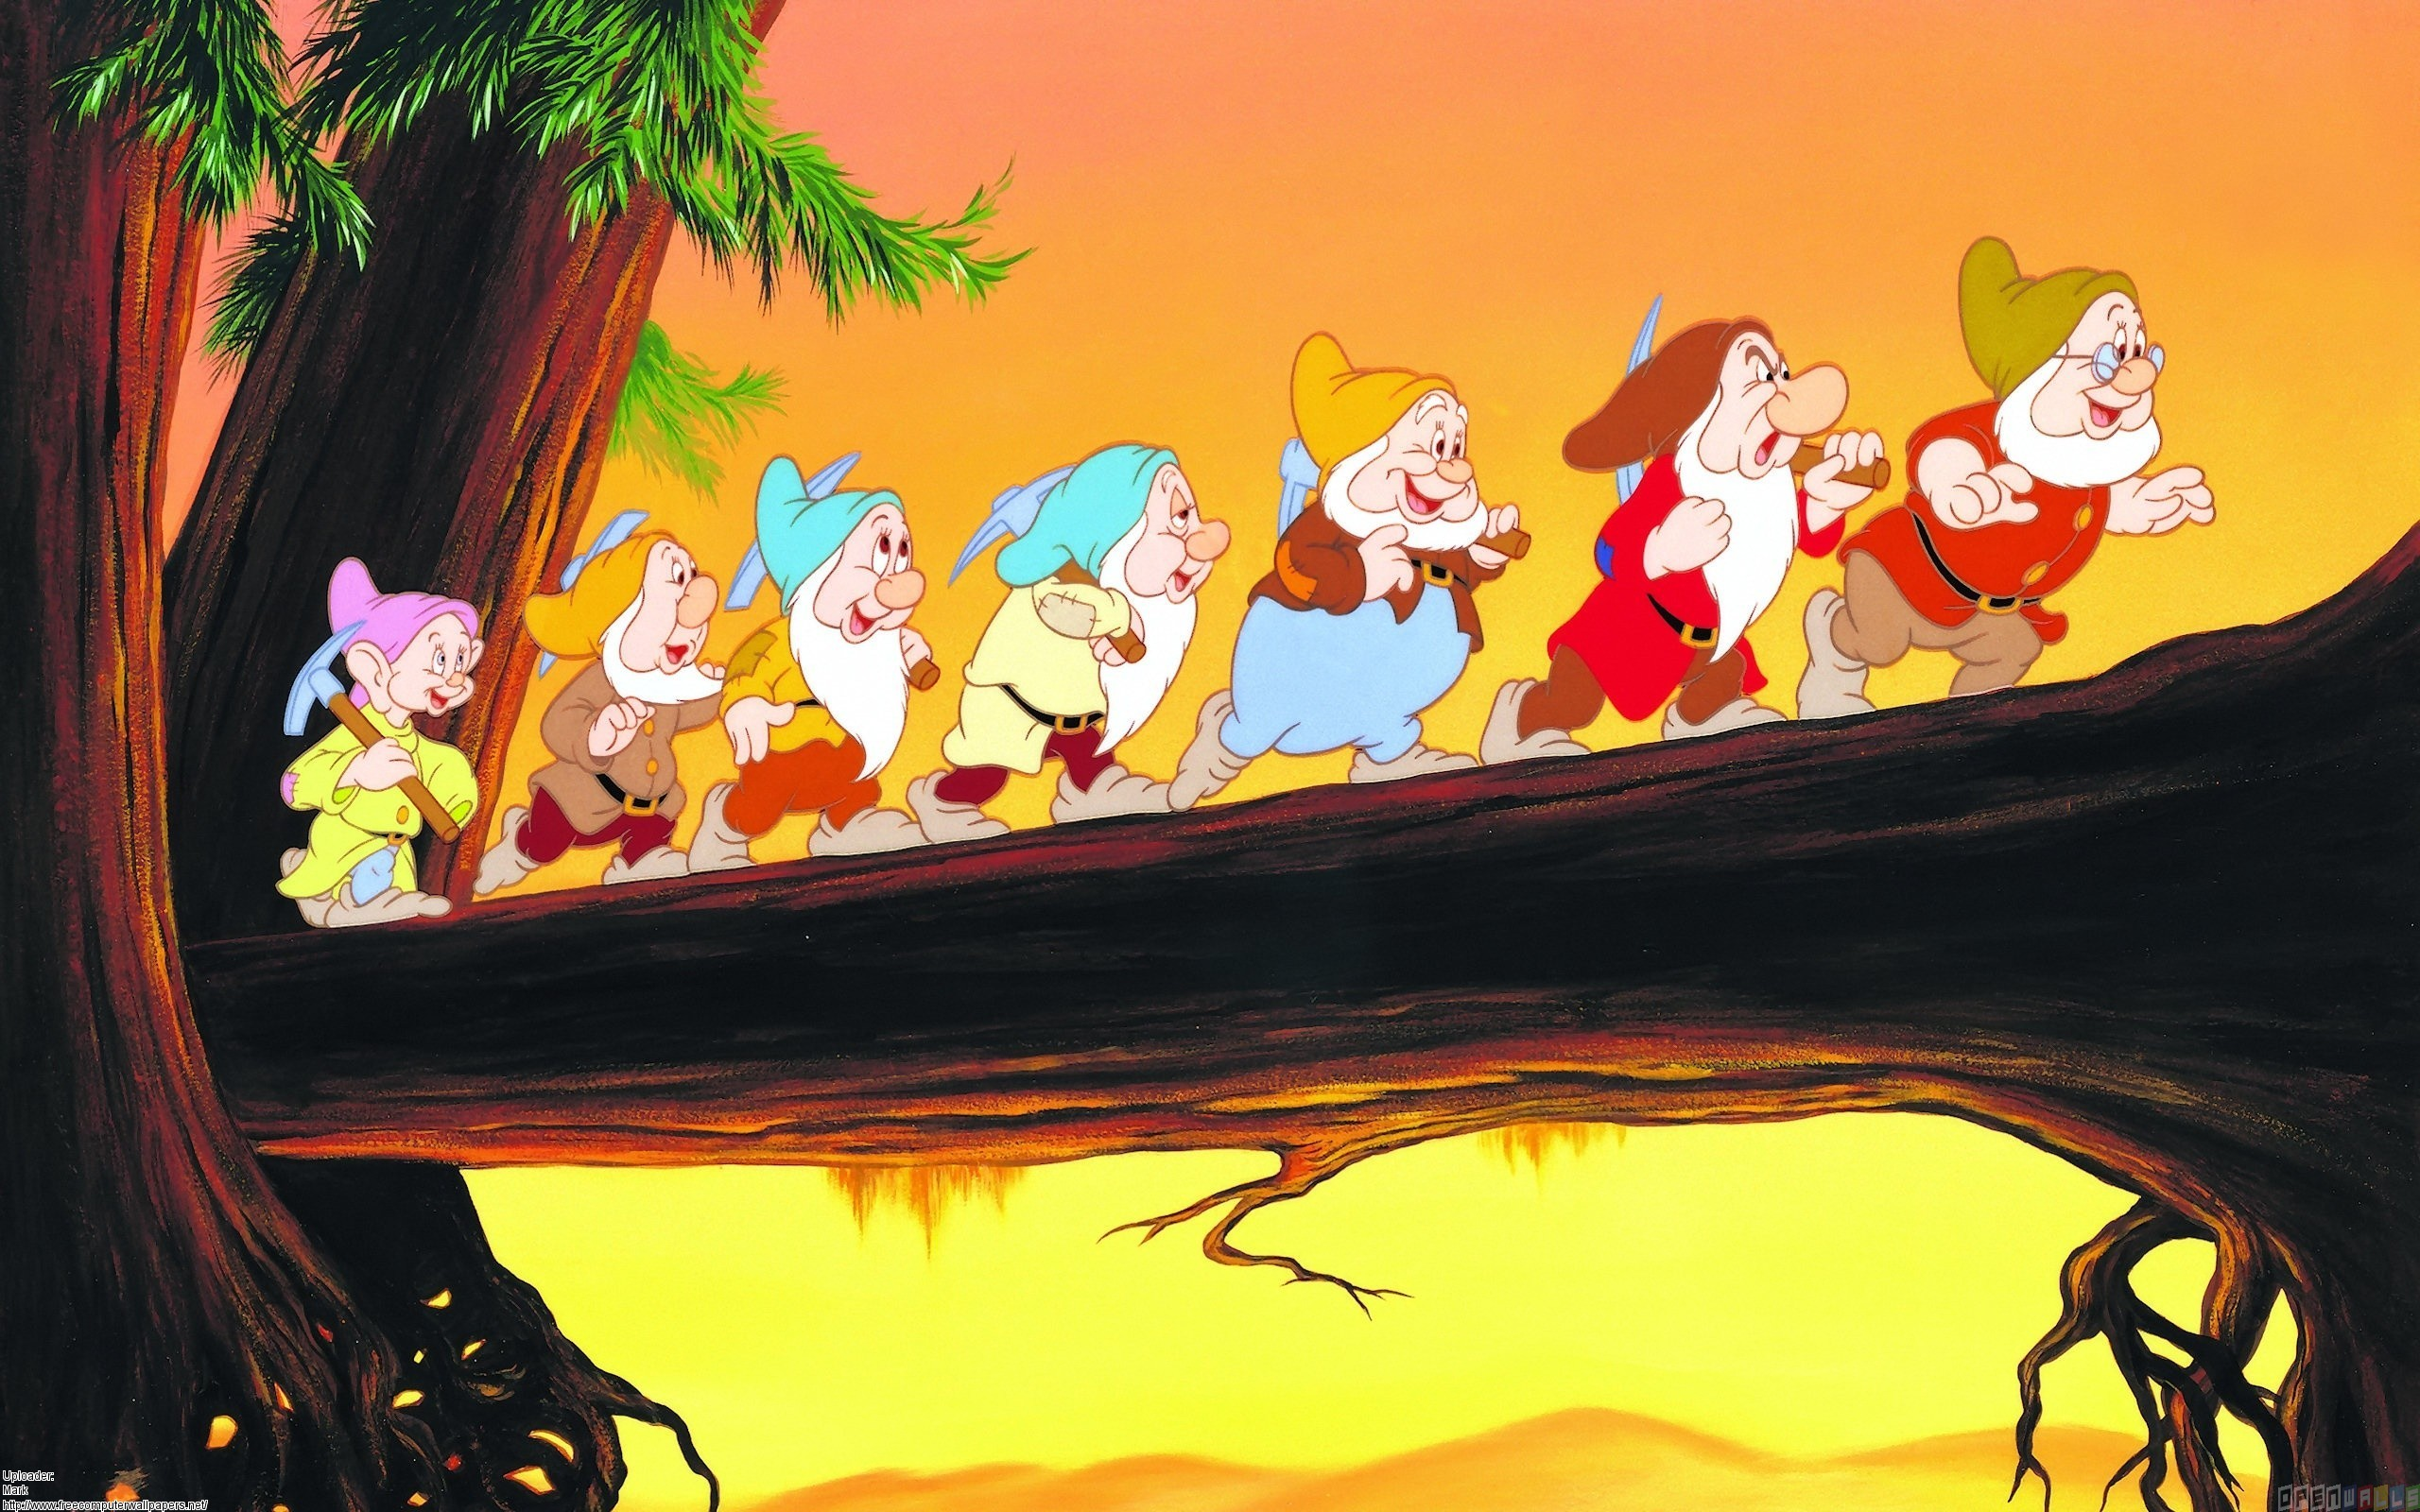 7 dwarfs names in order - 7 Dwarfs Names In Order 16